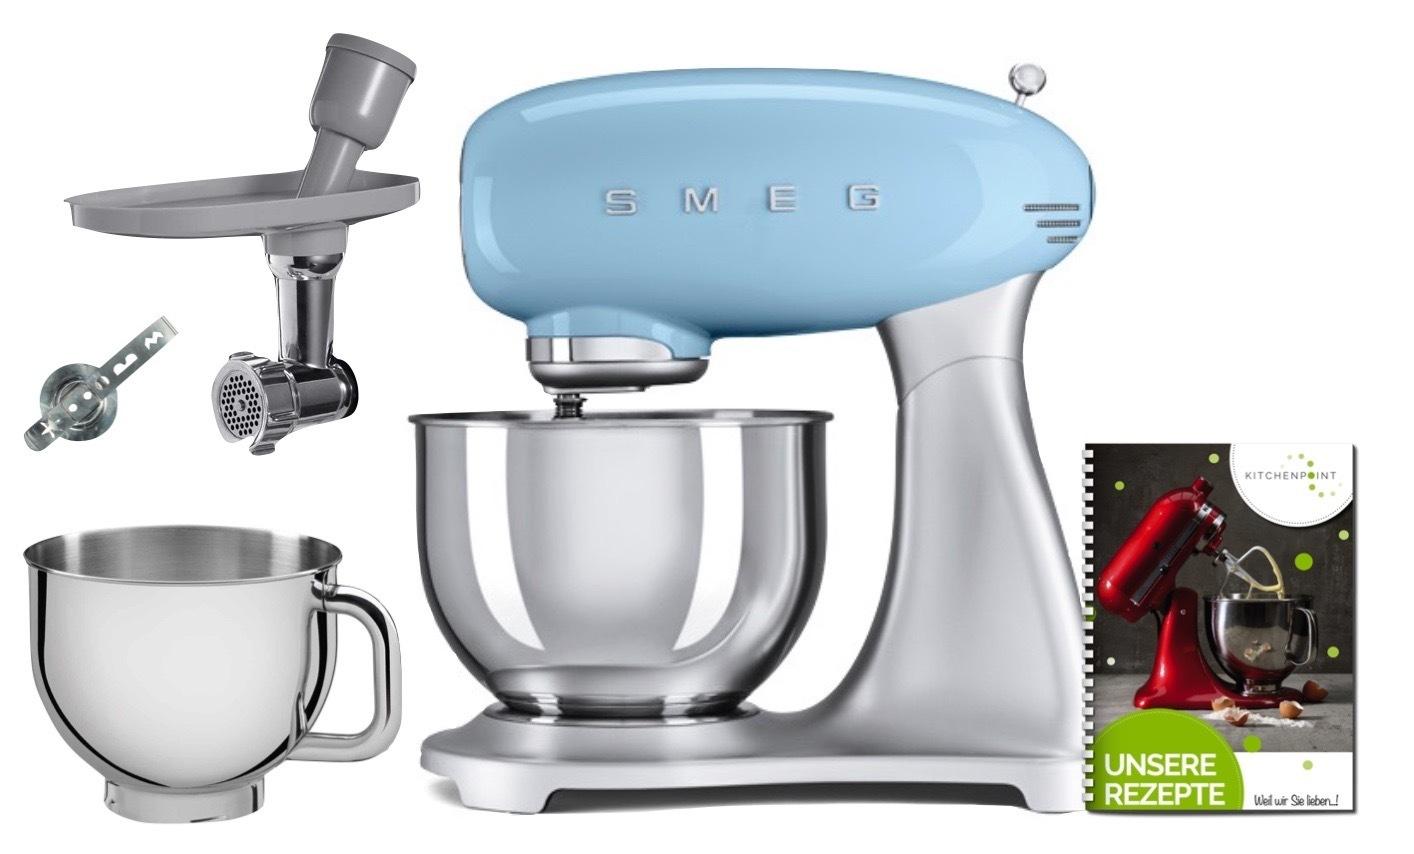 SMEG Küchenmaschine  SMF02 - Back Mega Set Pastellblau